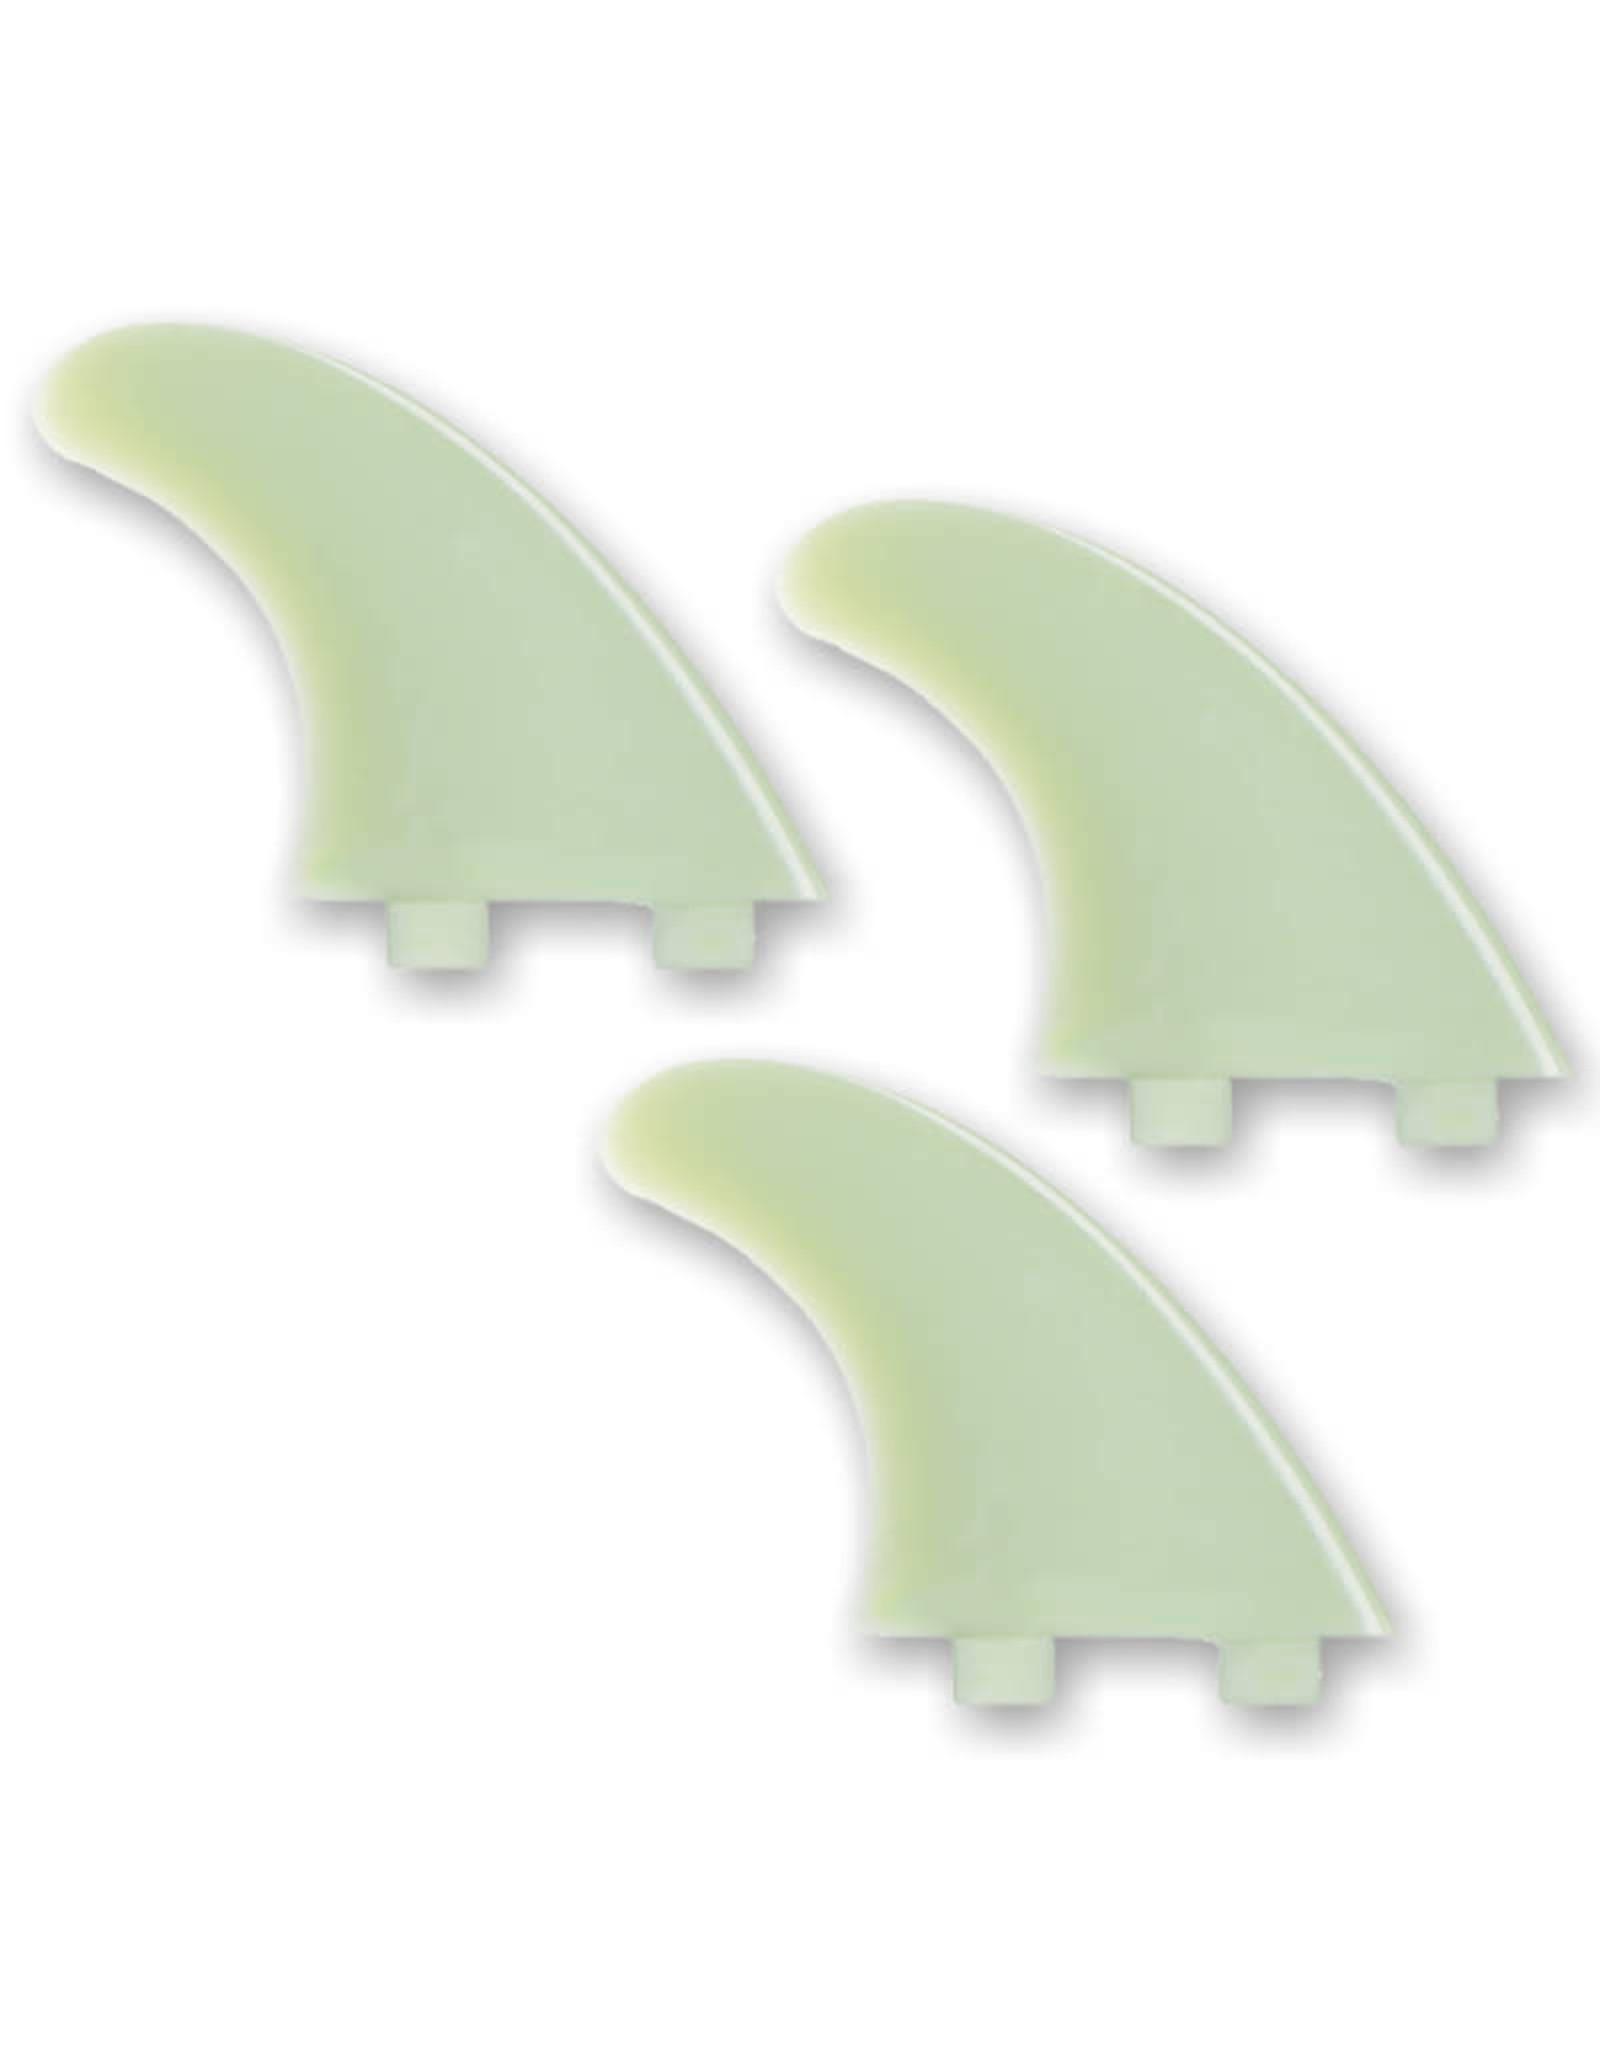 Koalition KOALITION Surfboard Fins Thruster M5 FCS